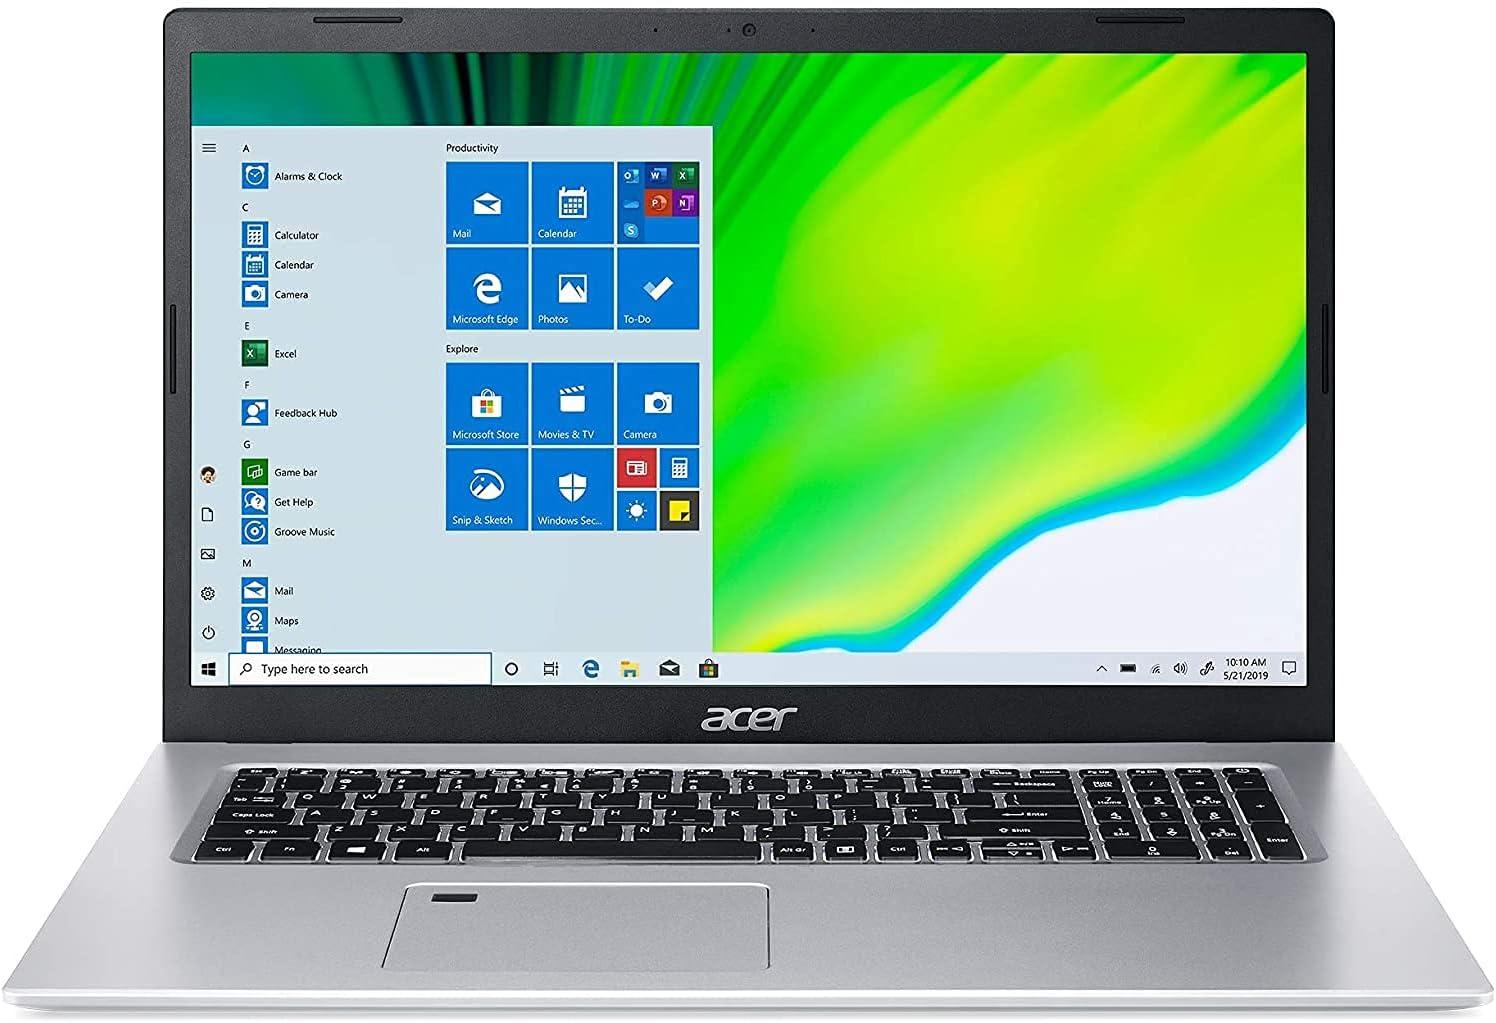 Acer Aspire 5 17.3